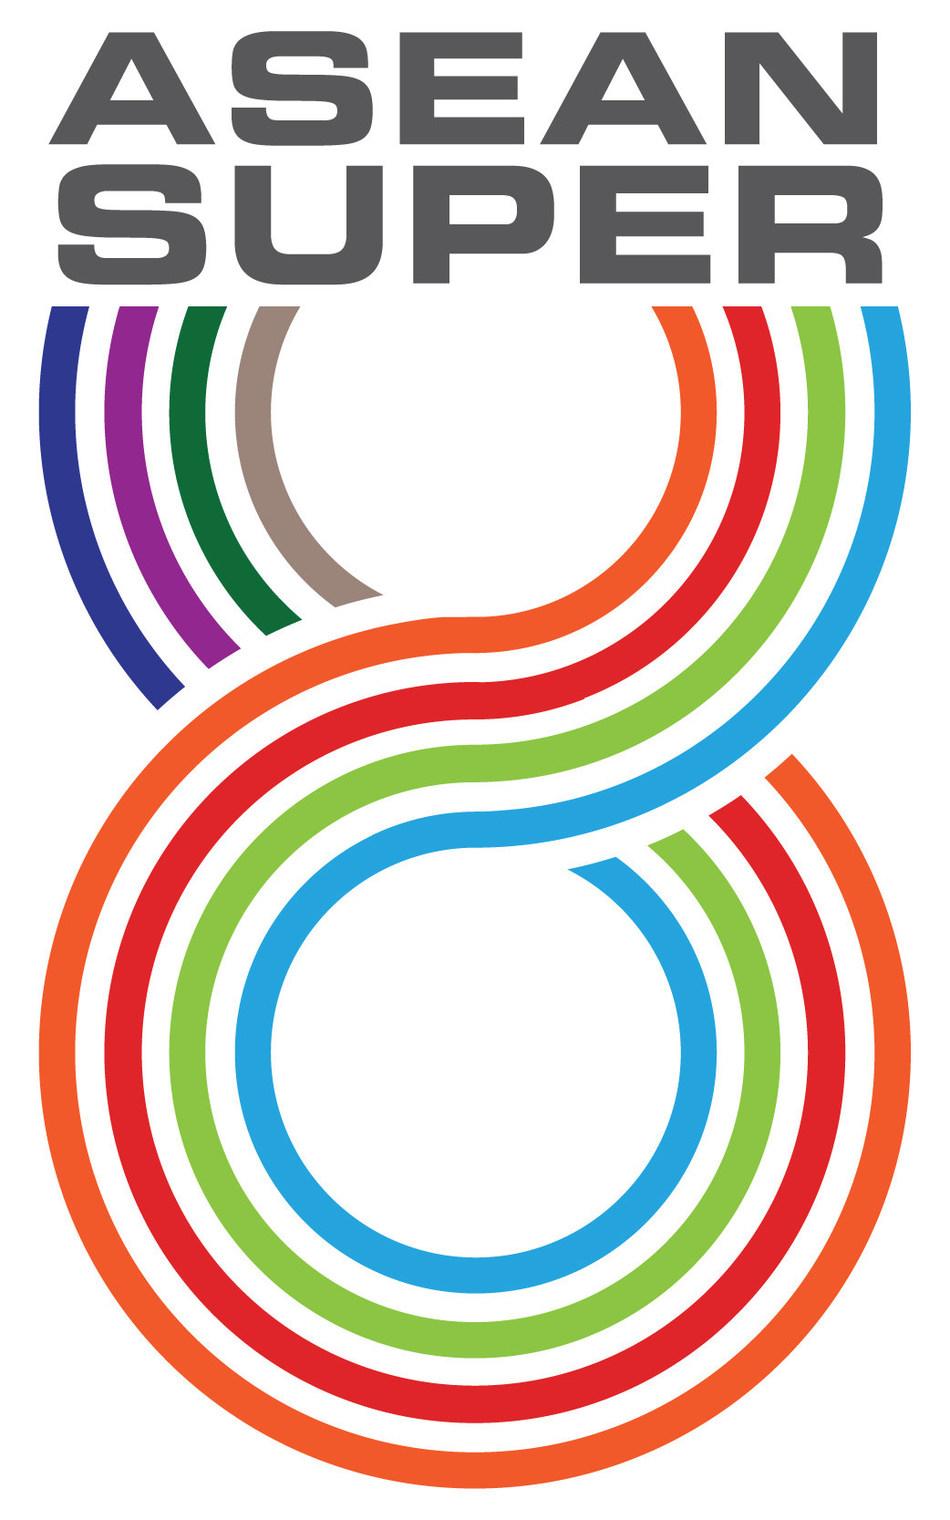 ASEAN Super 8 Logo